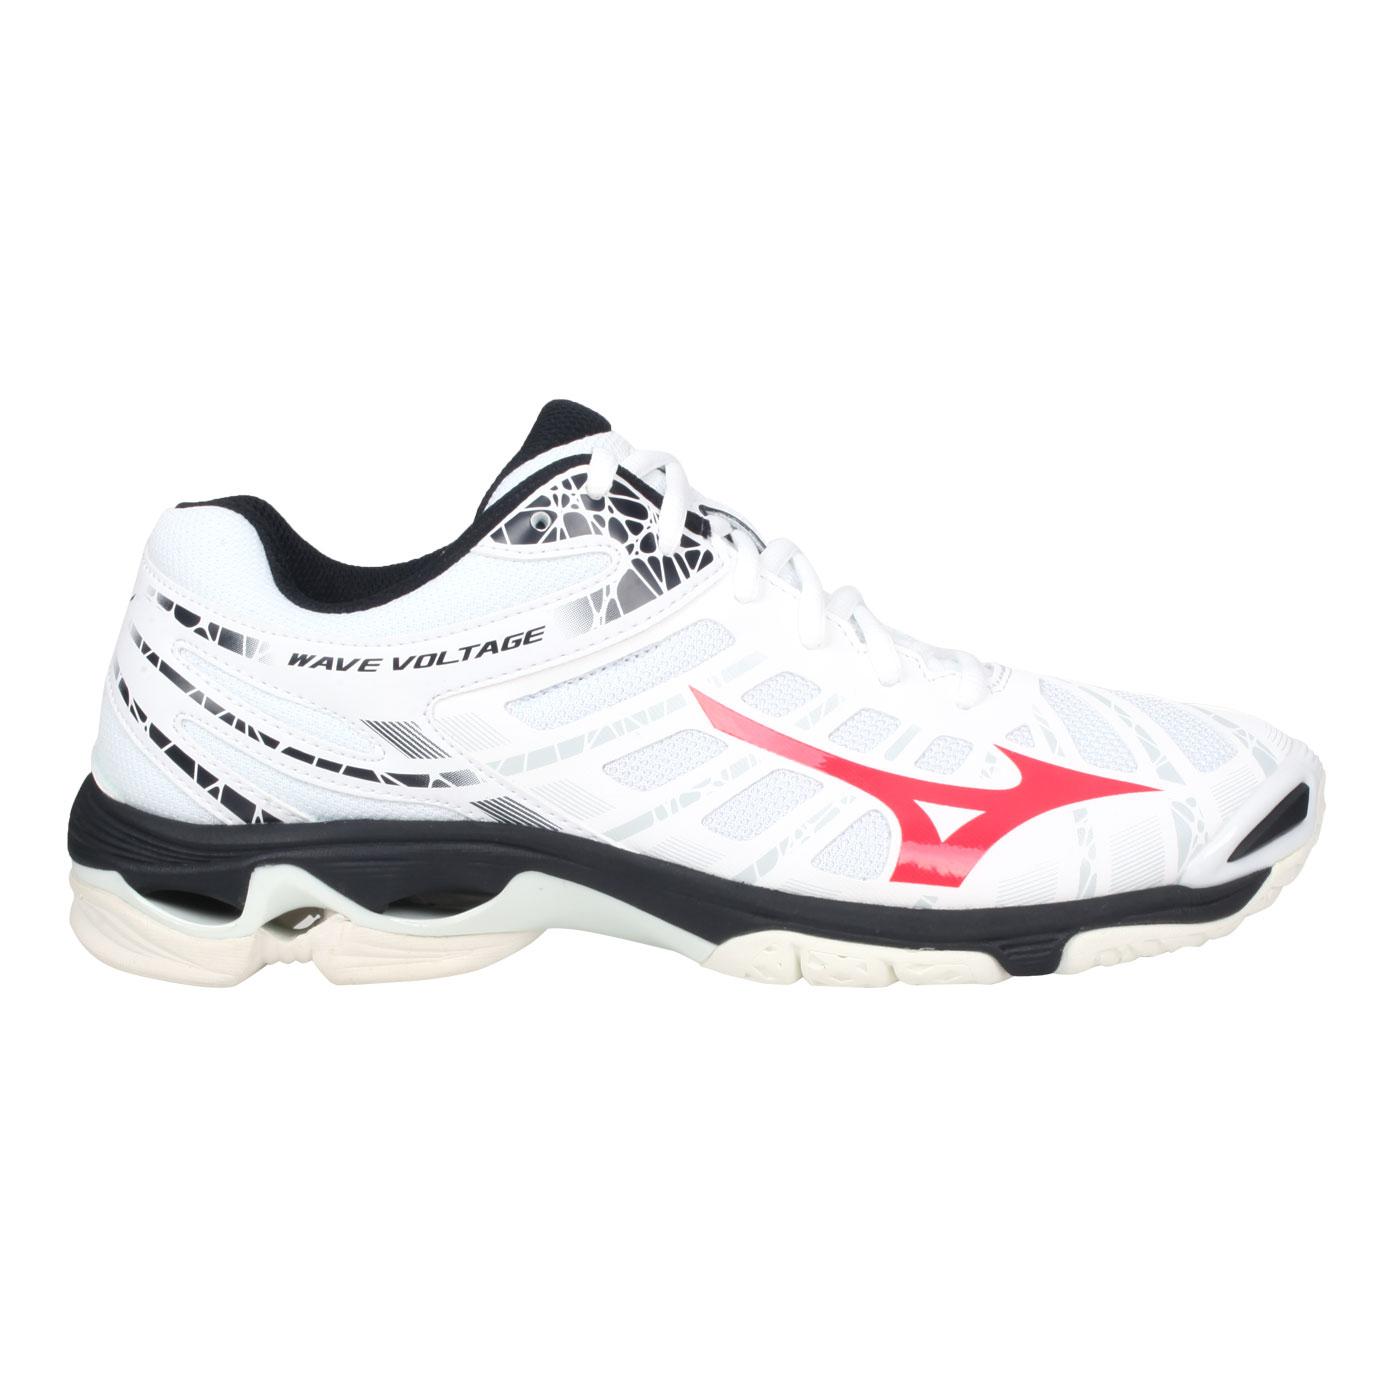 MIZUNO 男款排球鞋  @WAVE VOLTAGE@V1GA196065 - 白黑